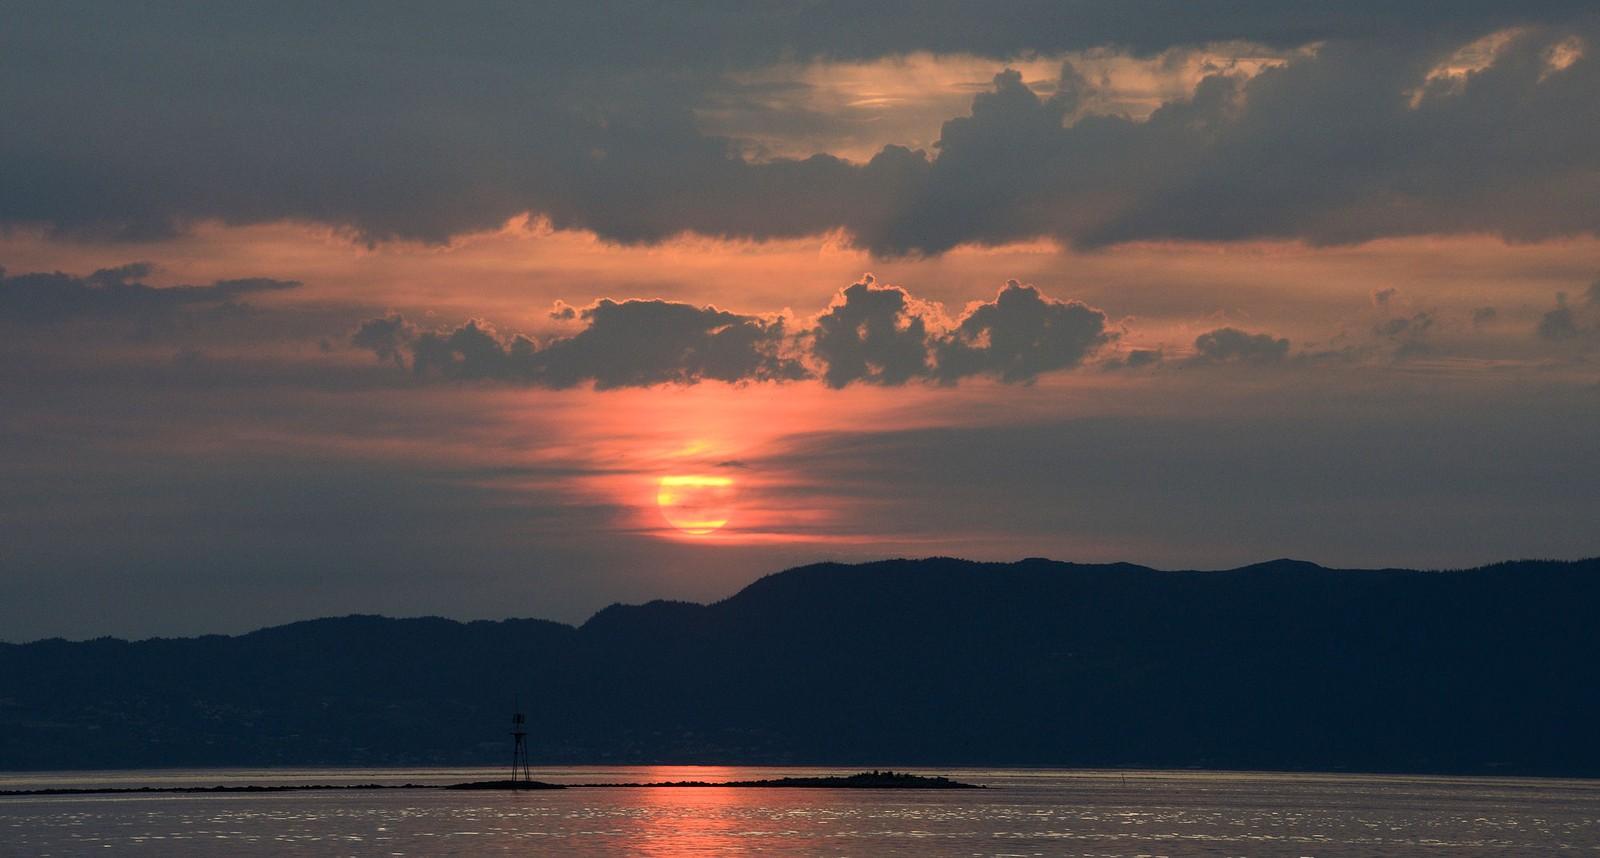 Solnedgang over Trondheimsfjorden